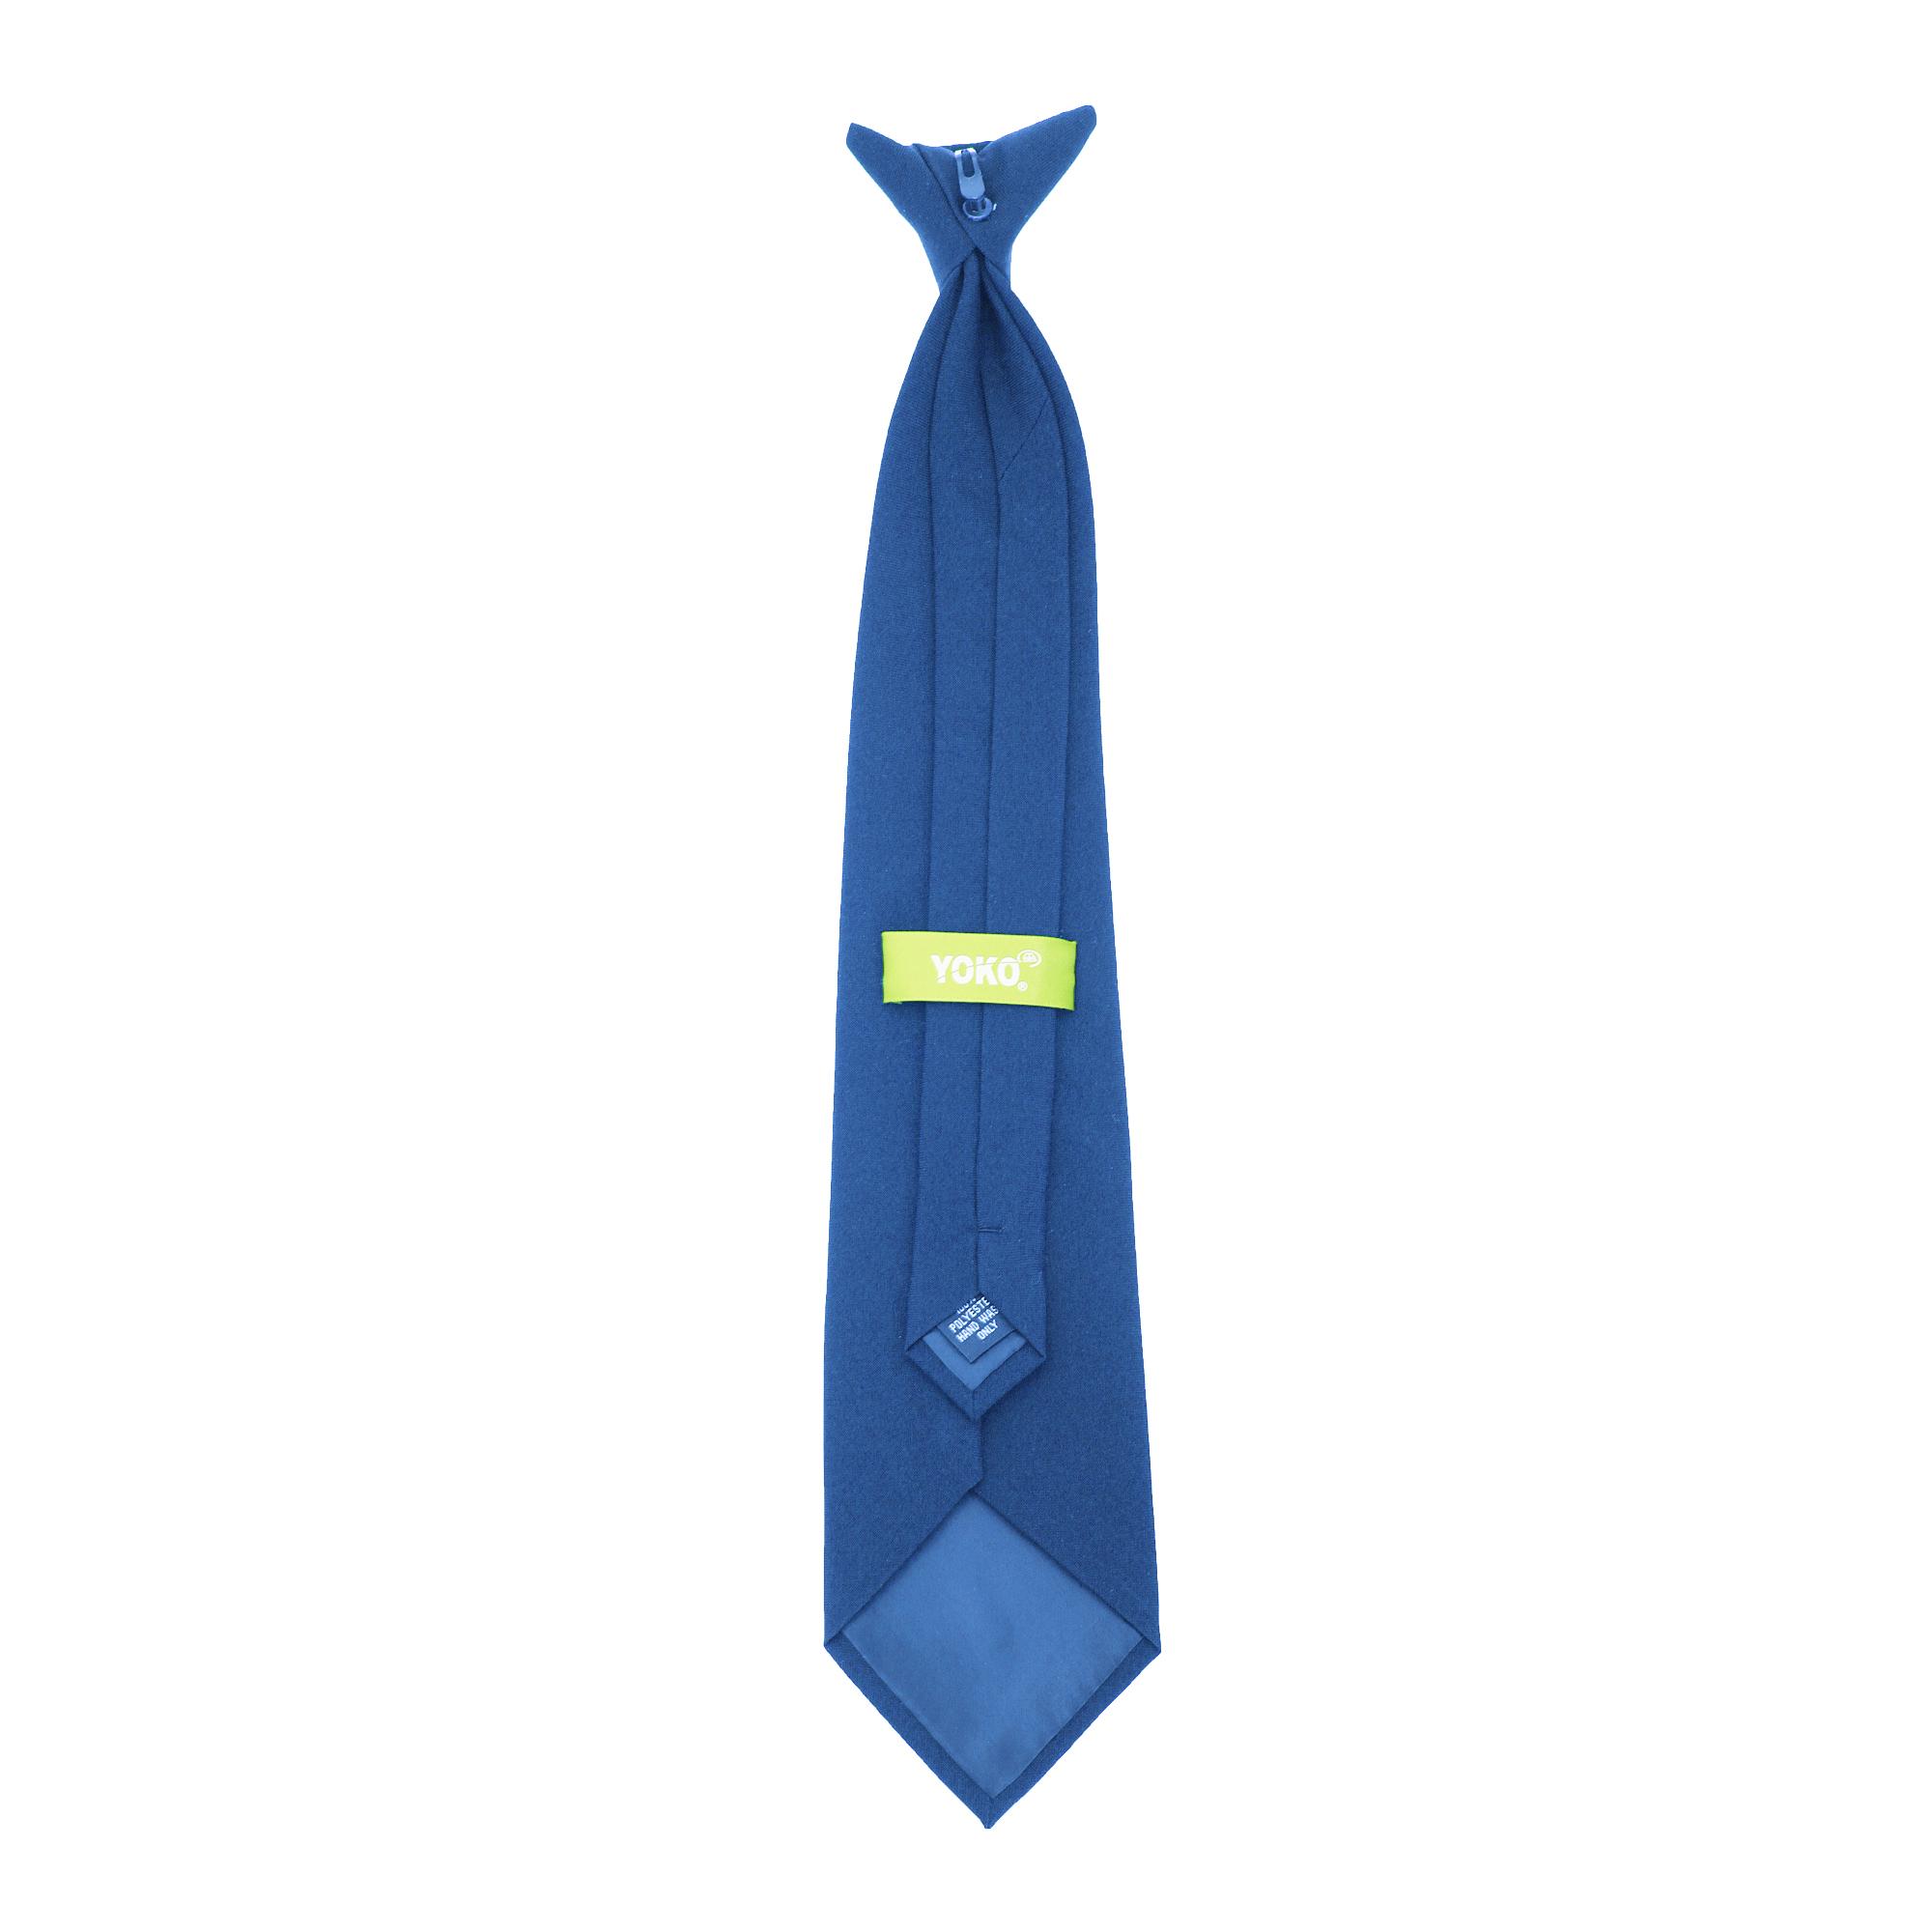 4 Stück//Packung Yoko Clip-On Krawatte BC4157